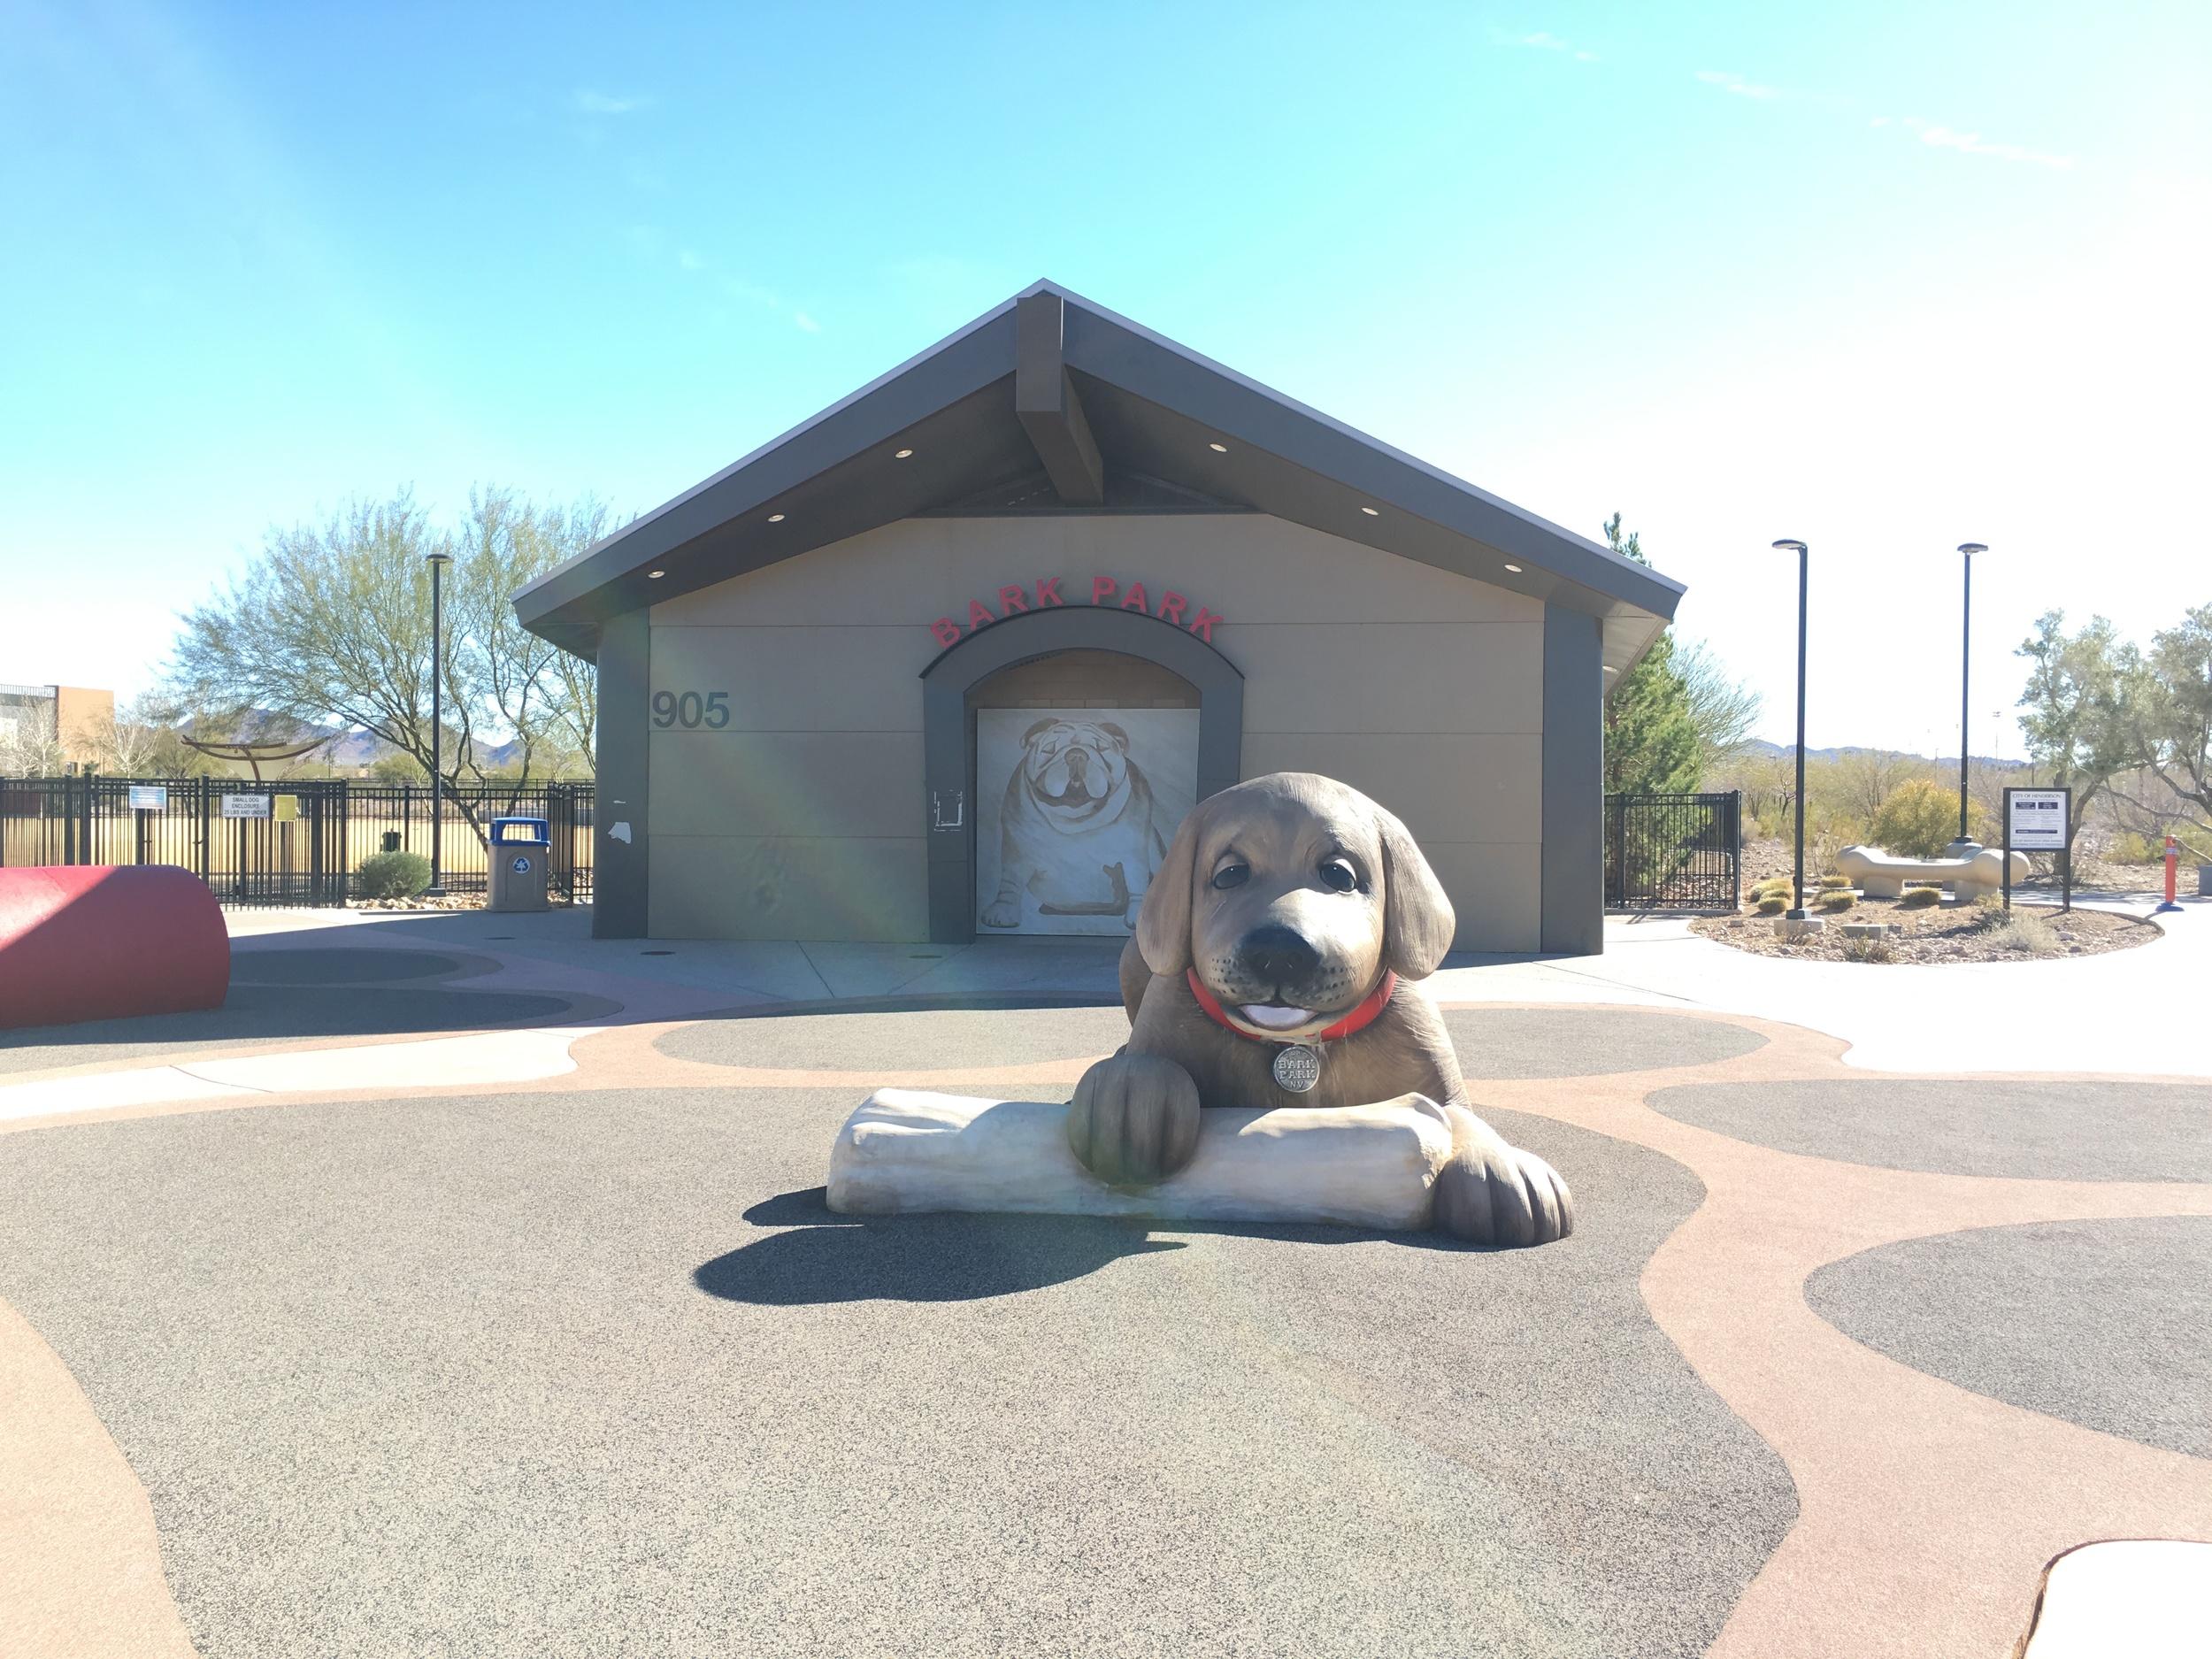 Bark Park and Barkules Puppy Mascot